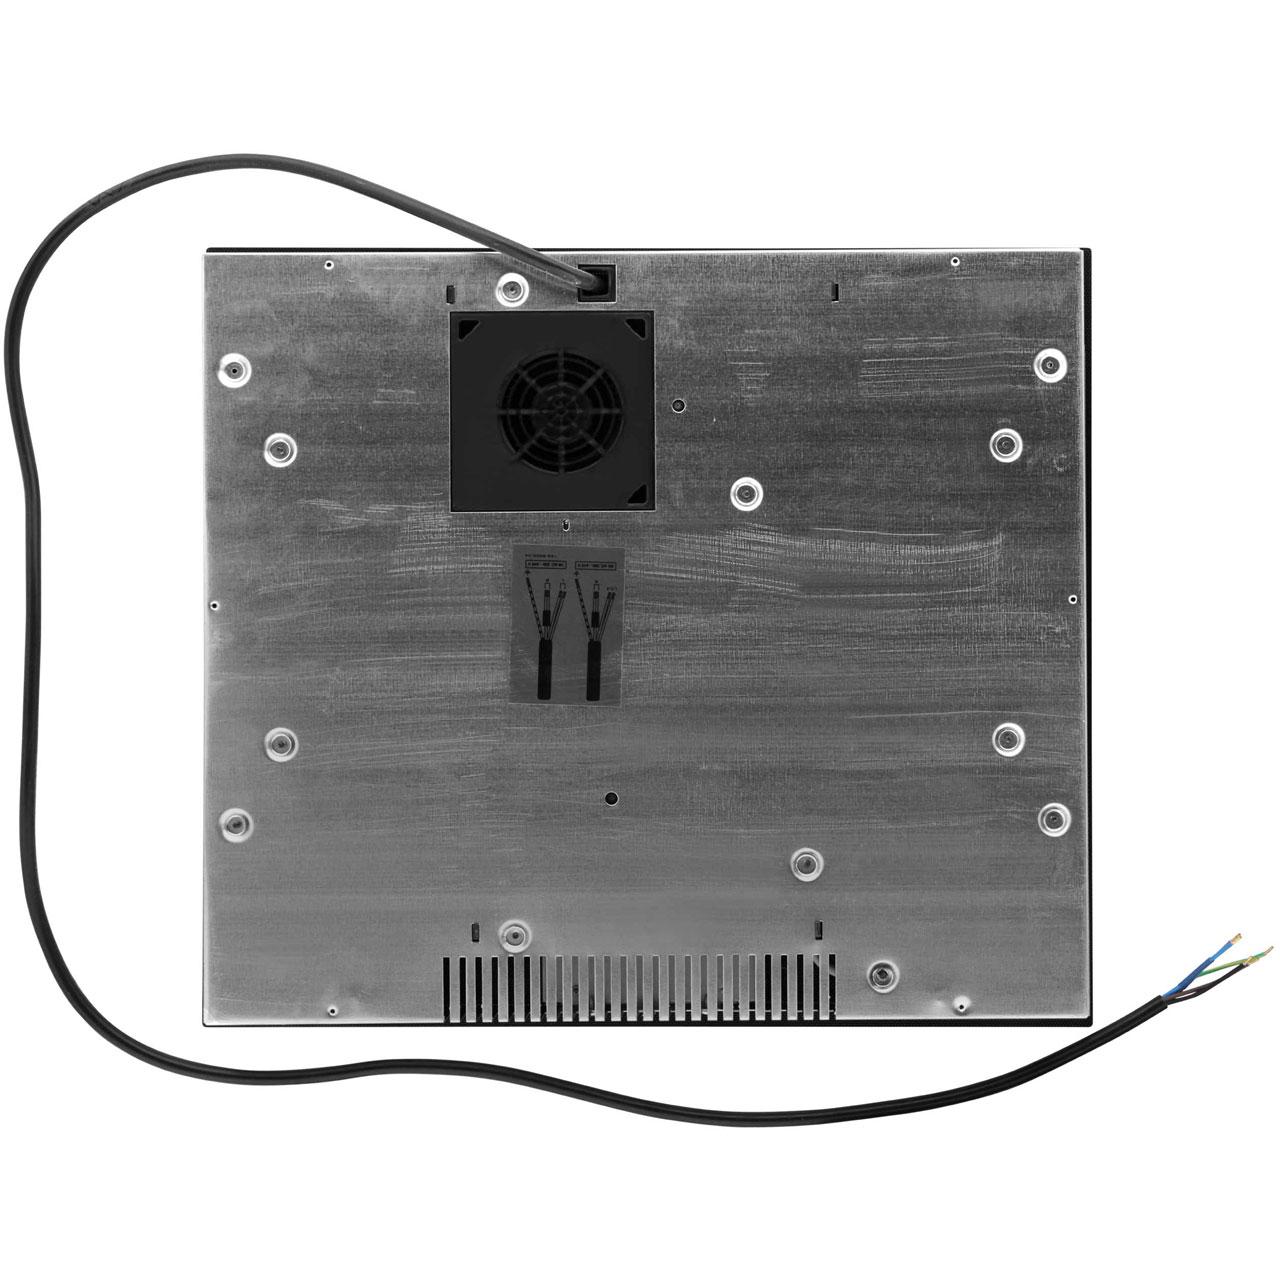 Boots Kitchen Appliances Washing Machines Fridges More Beko Machine Wiring Diagram Our Images 6